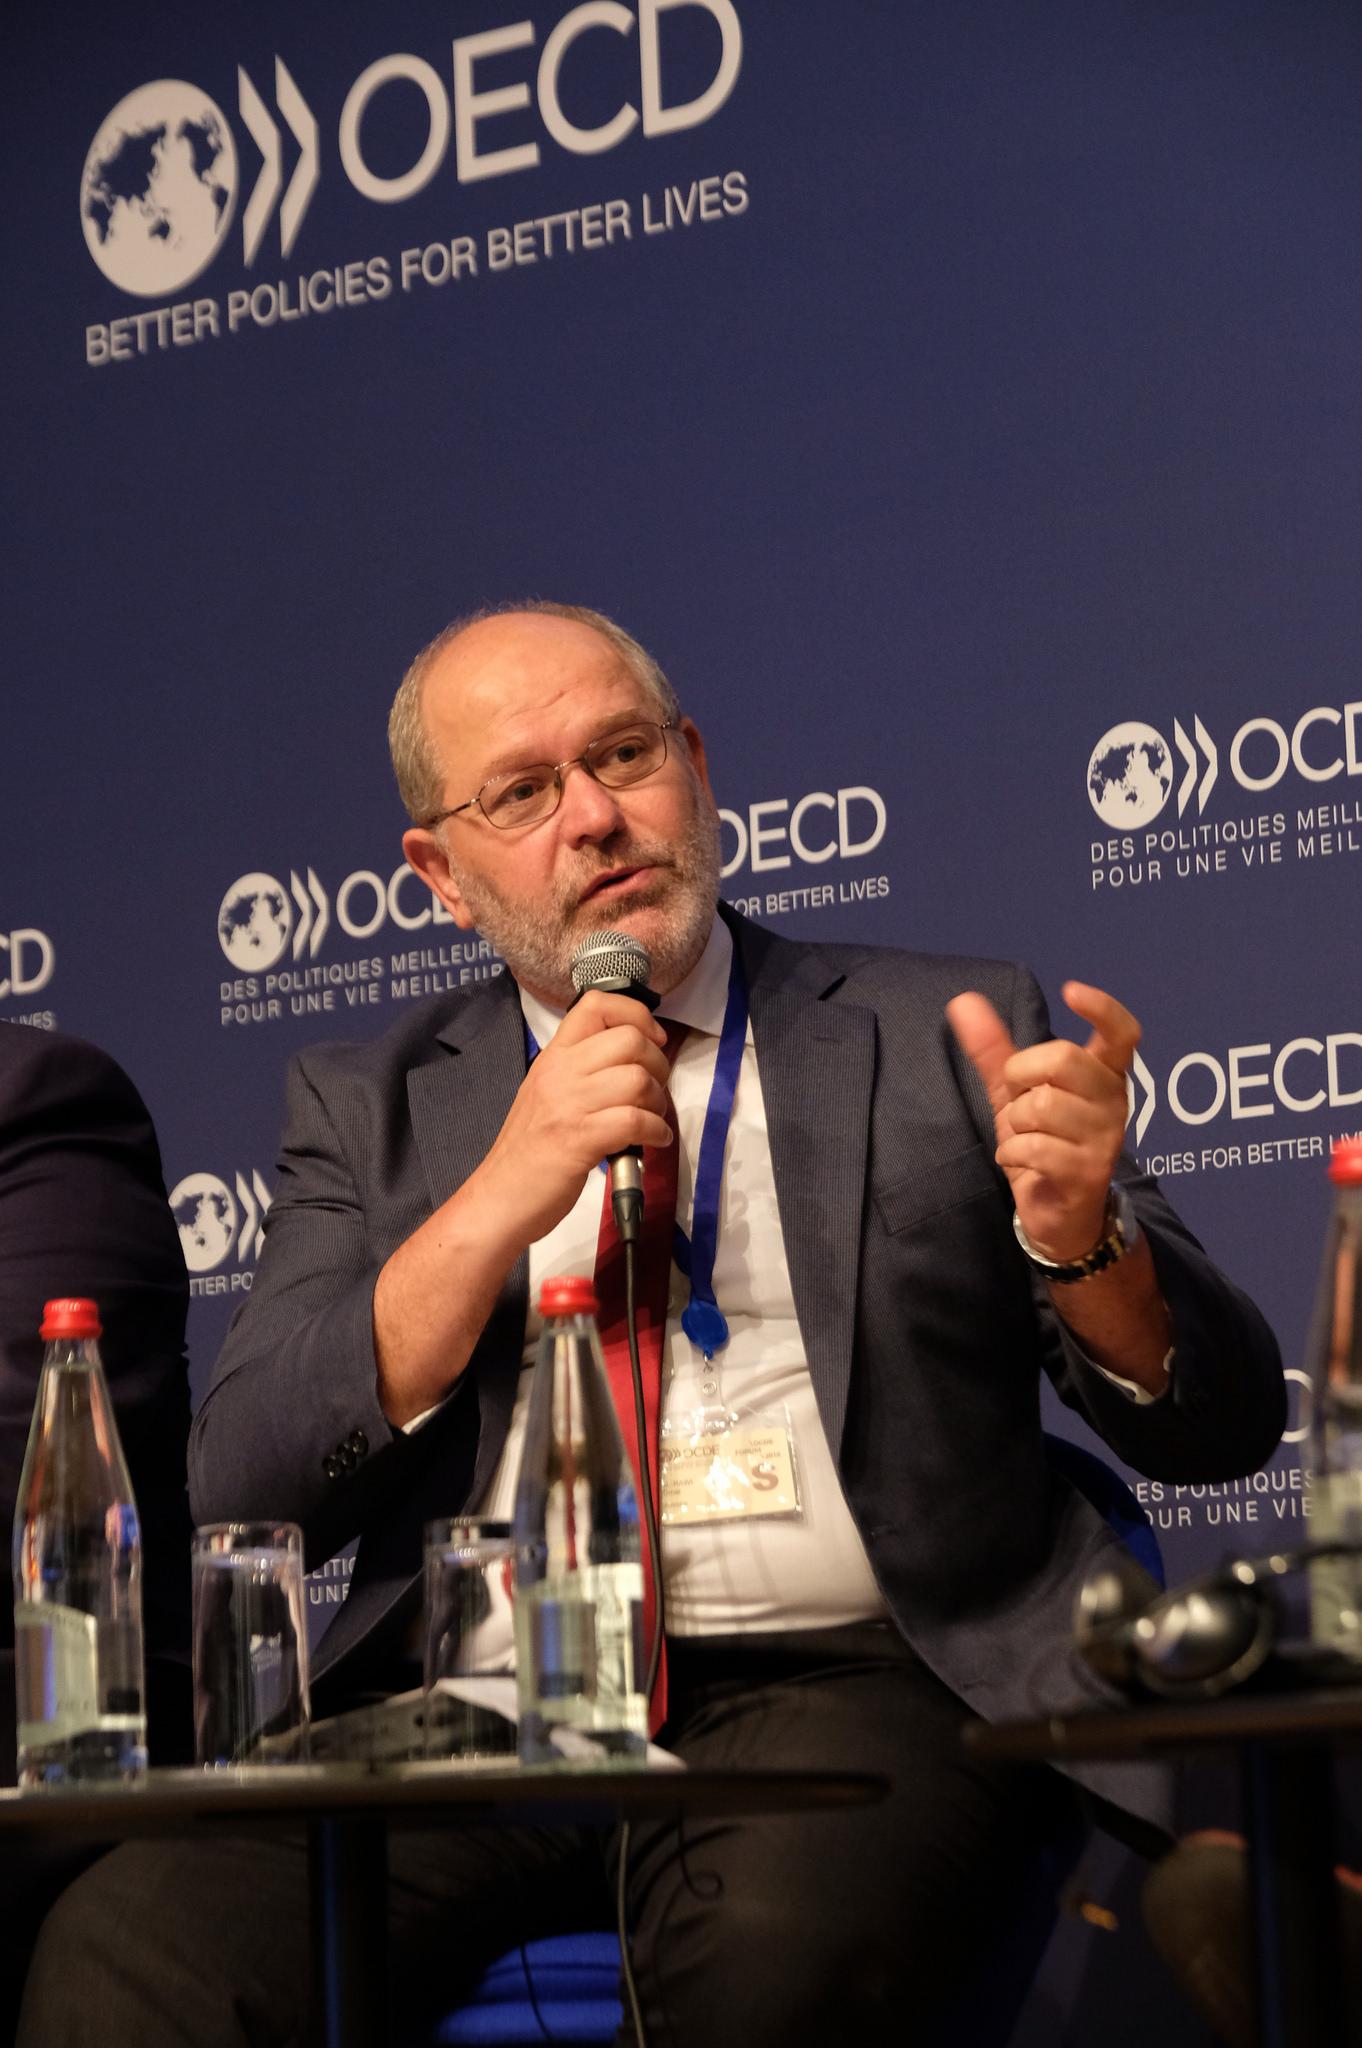 Omar Al-Rawi, Member, City Council of Vienna